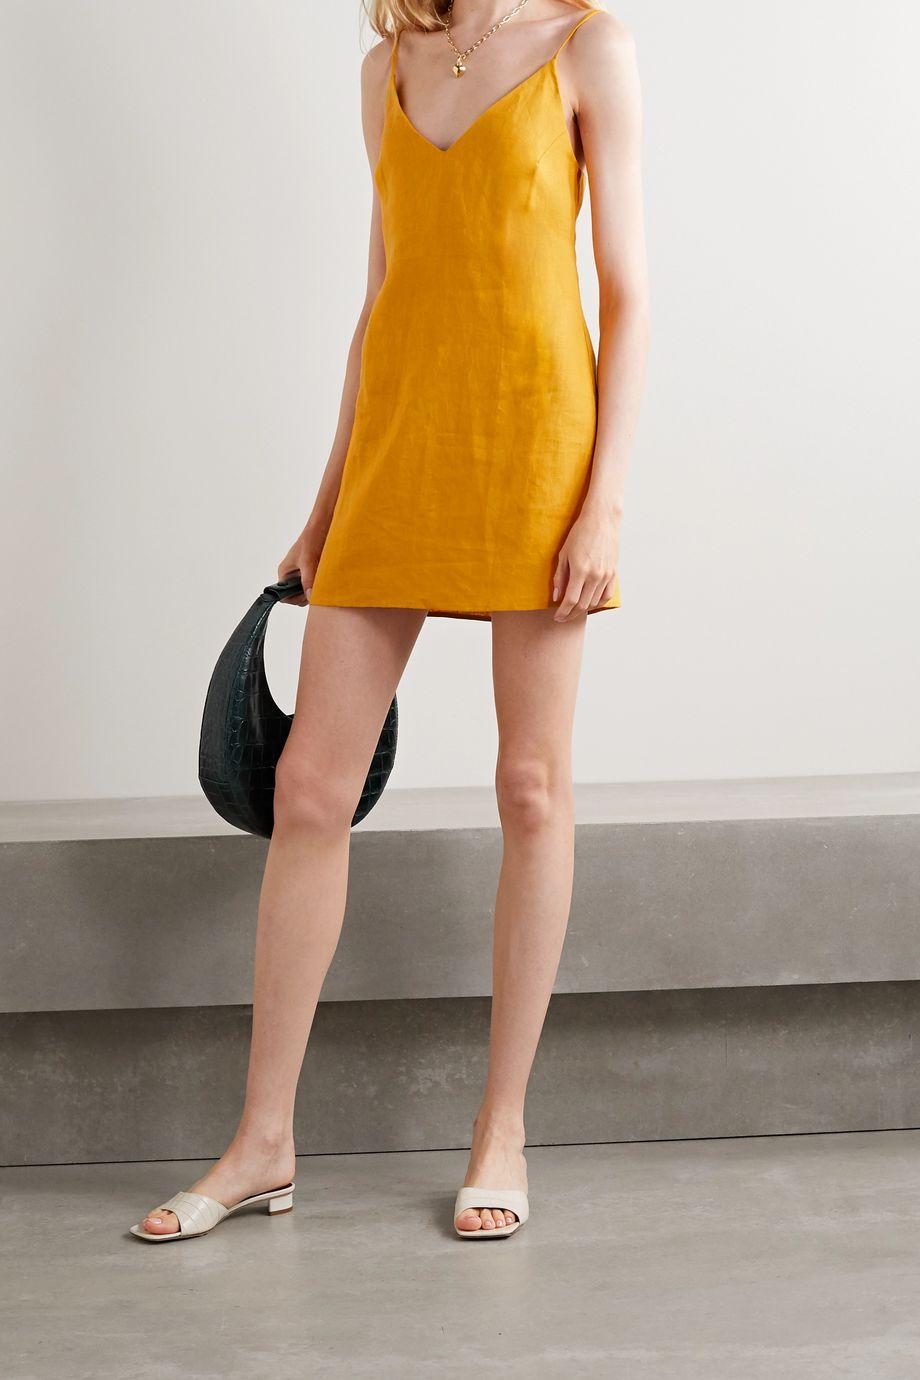 Reformation Riverside linen mini dress